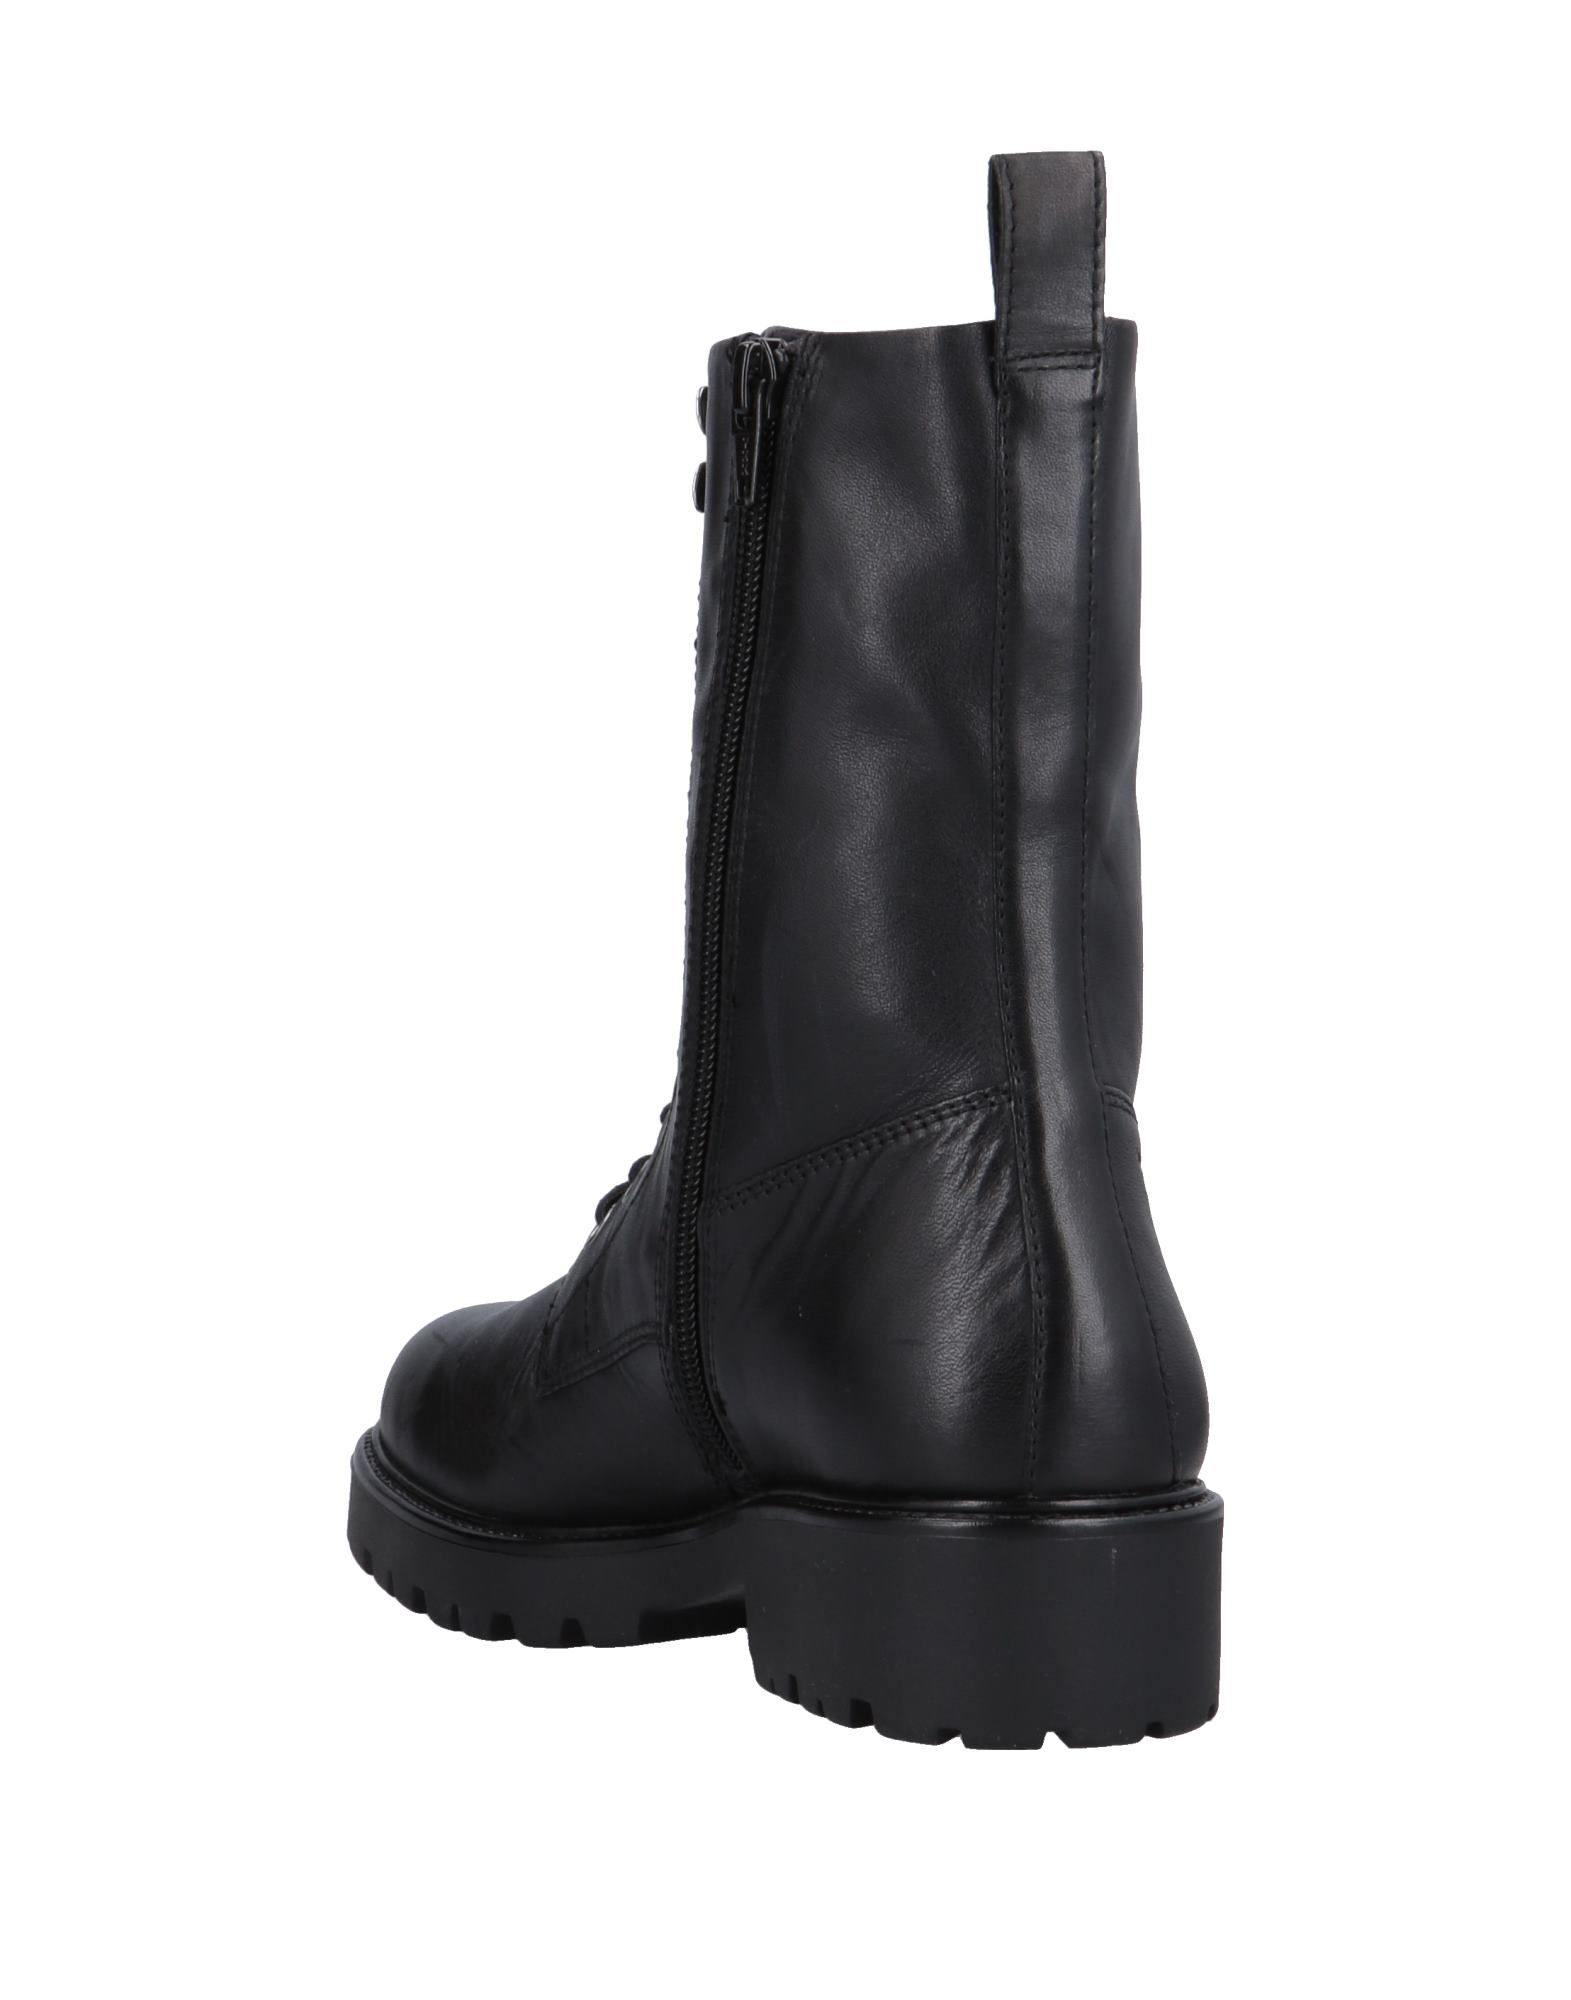 Stilvolle Stiefelette billige Schuhe Vagabond Shoemakers Stiefelette Stilvolle Damen  11549109UV b1fe7d